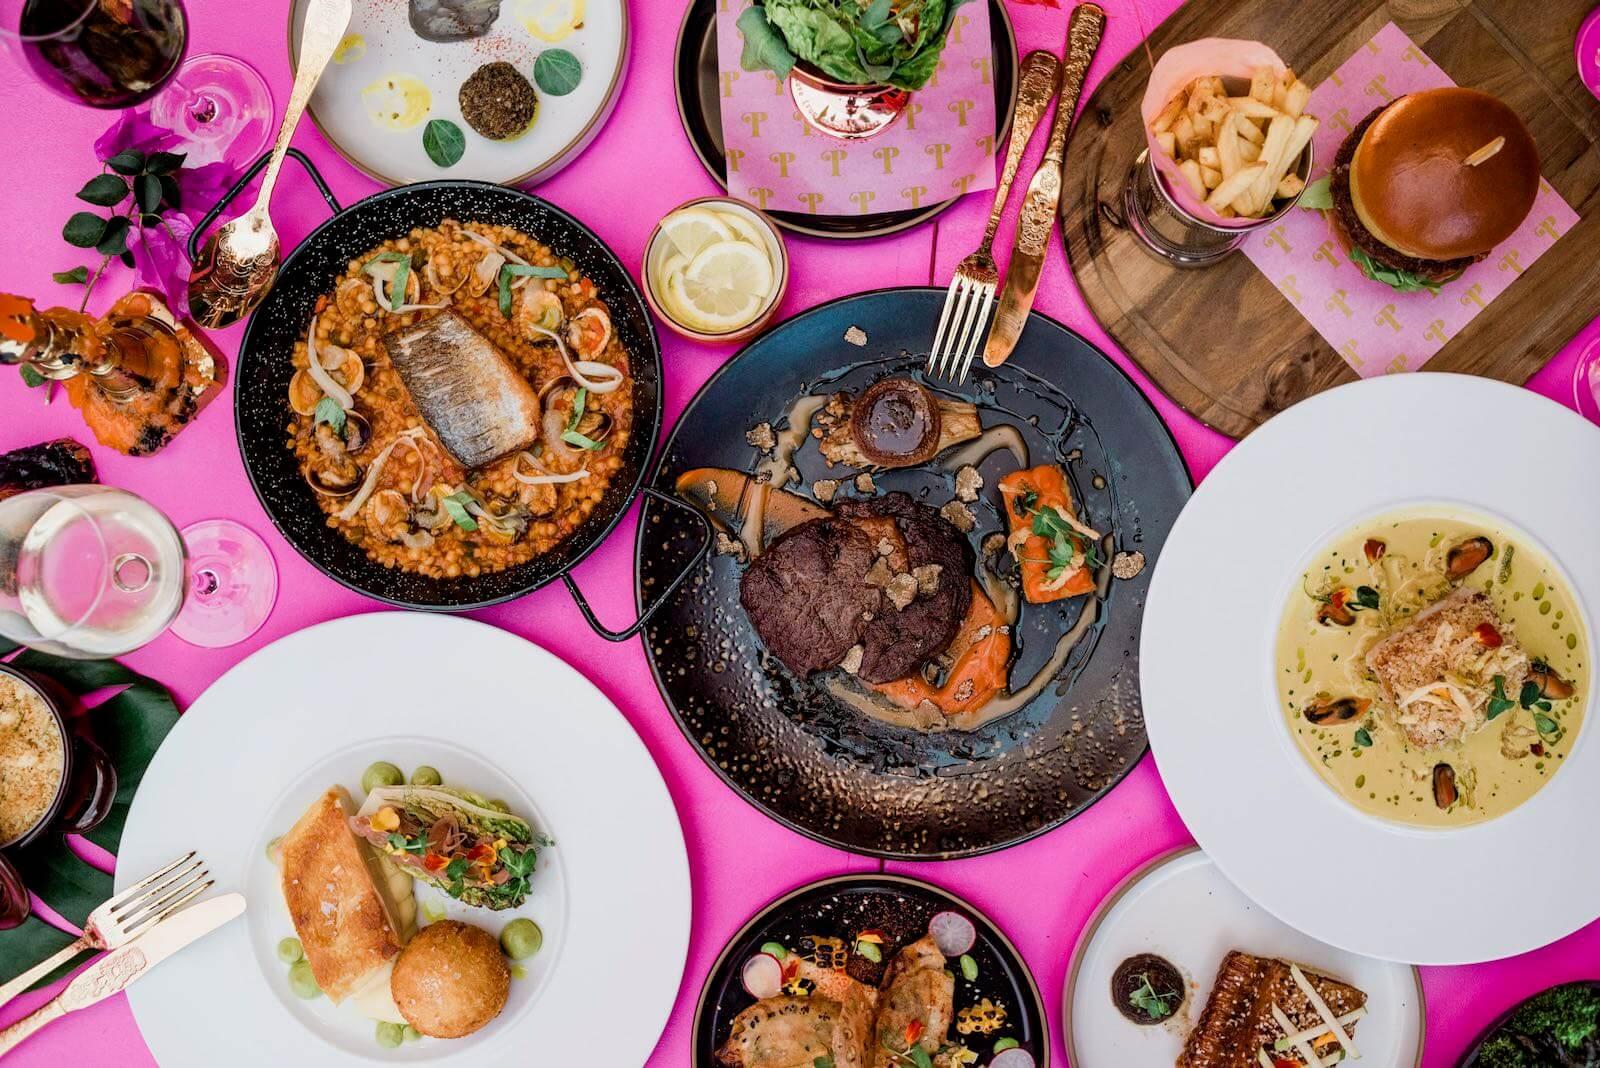 https://www.white-ibiza.com/wp-content/uploads/2020/03/ibiza-restaurant-pamelas-at-pikes-ibiza-2020-09.jpeg